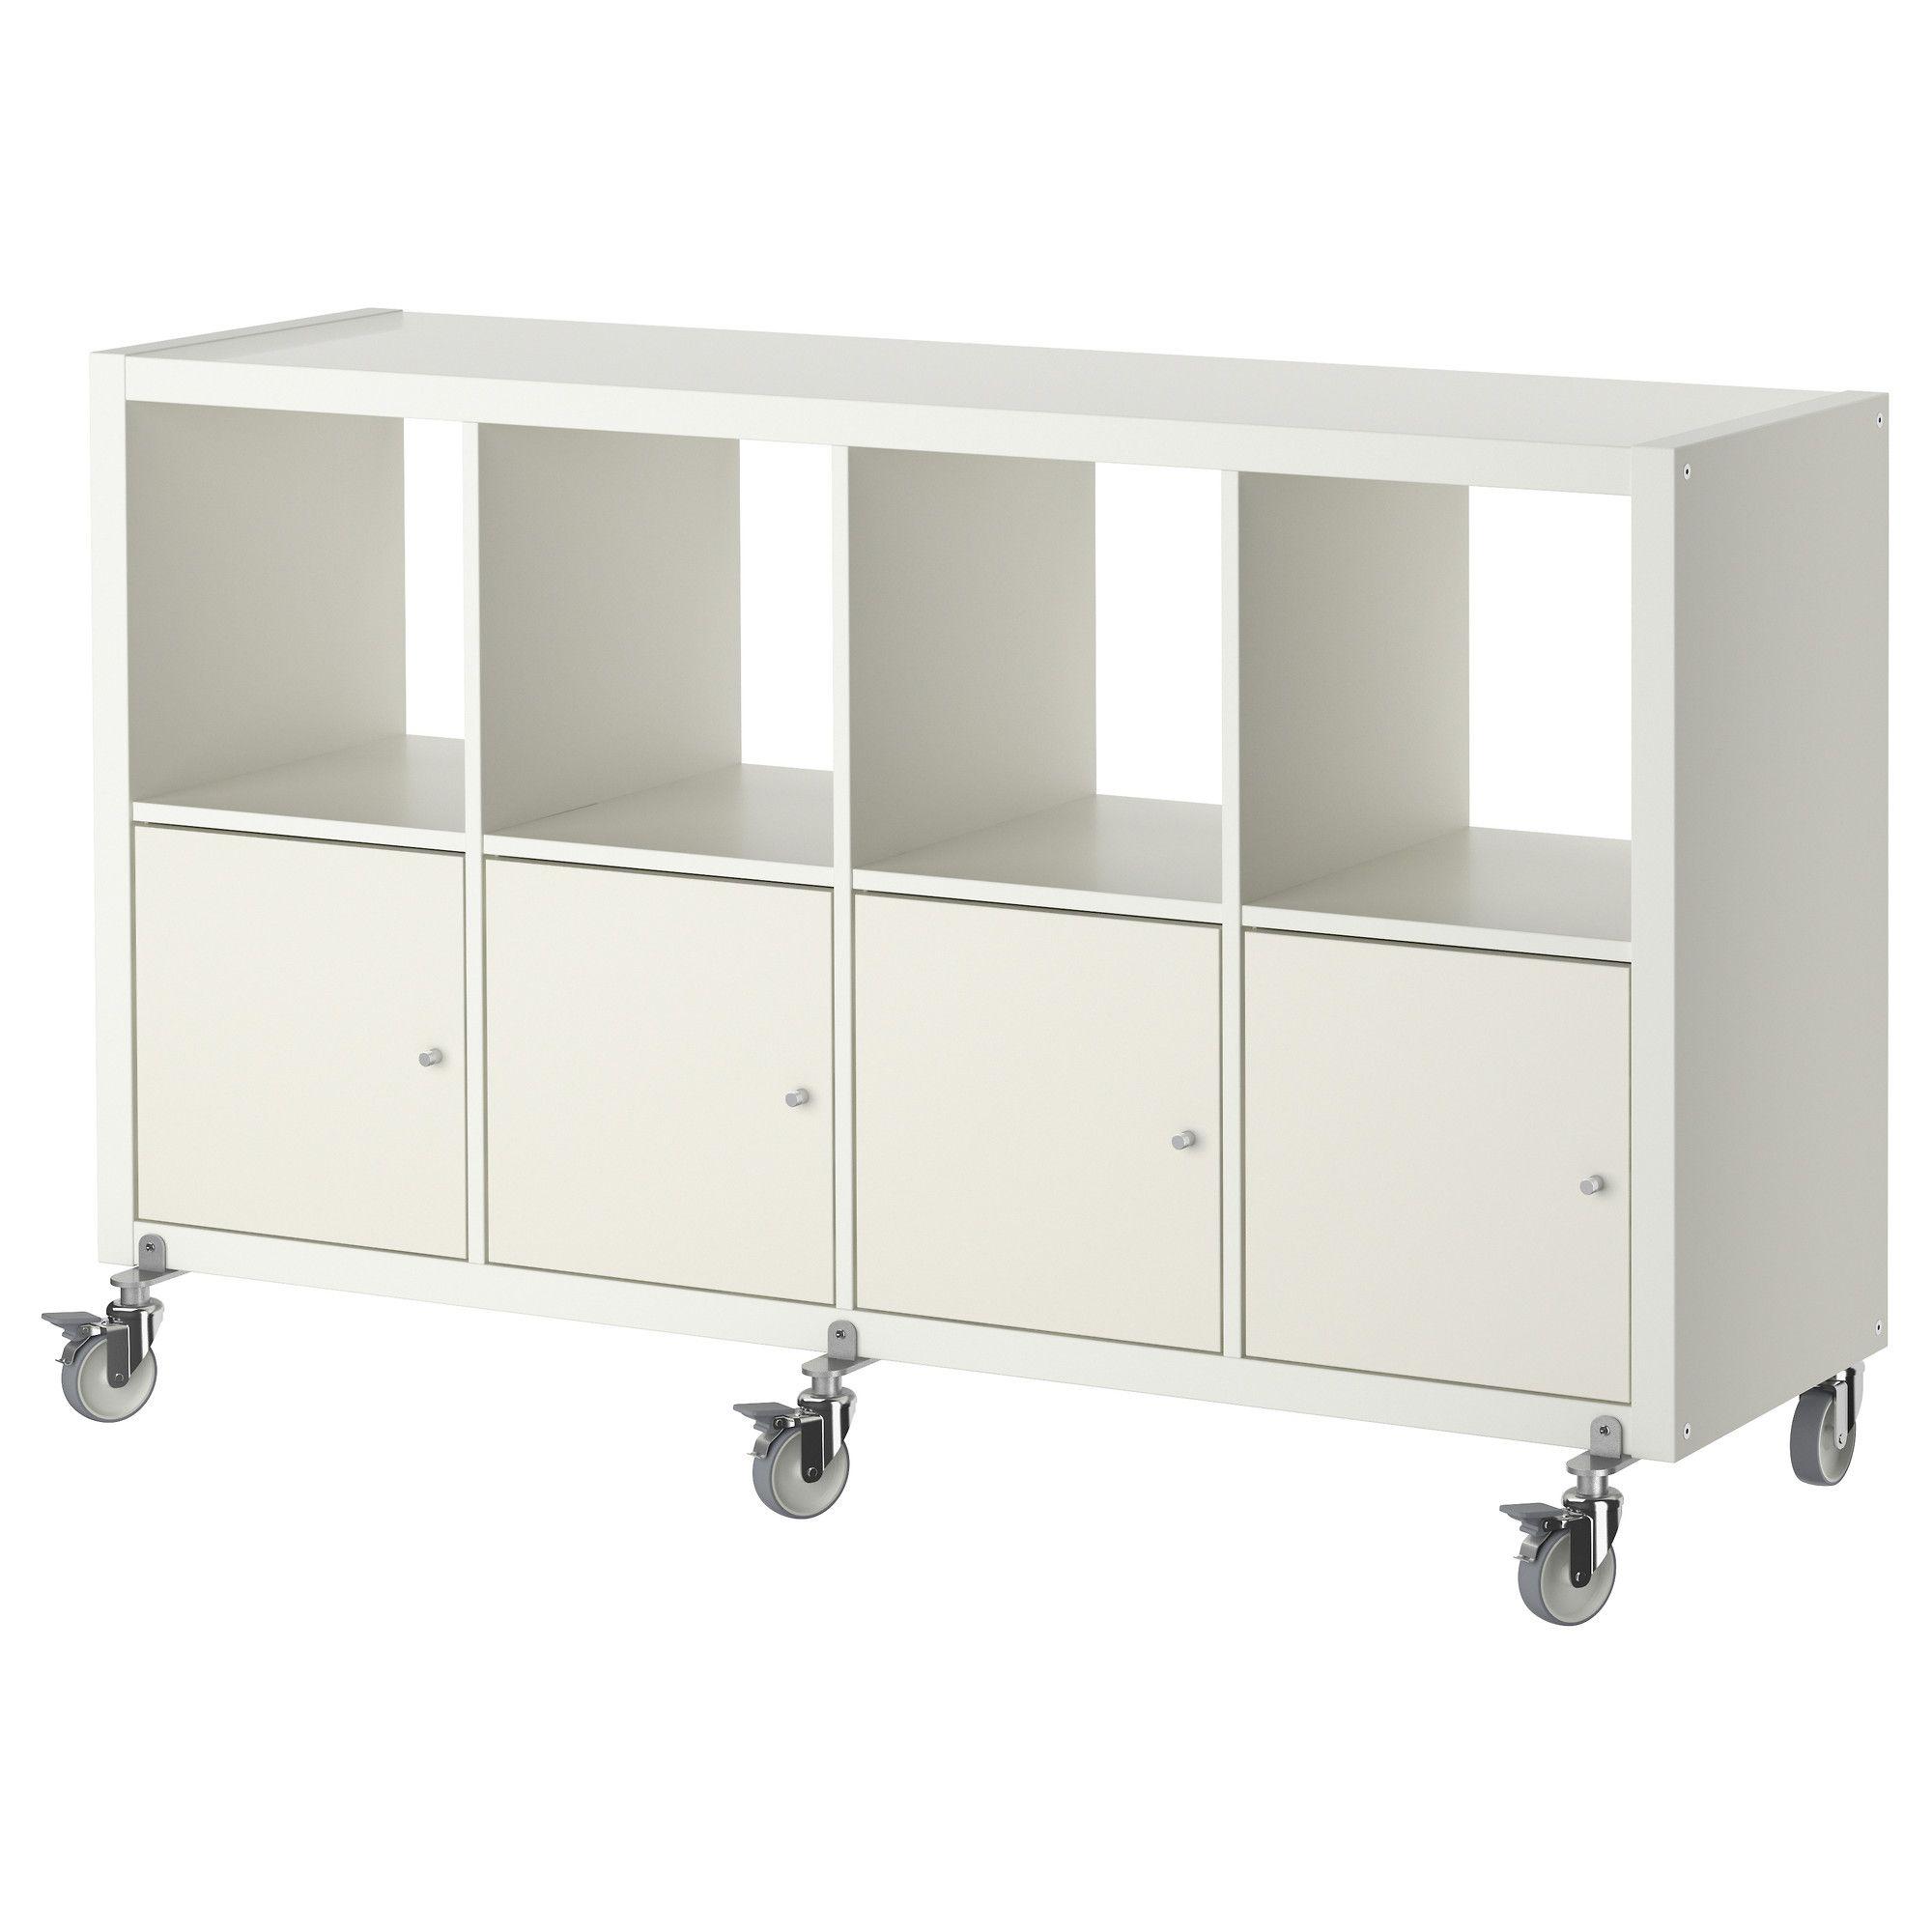 KALLAX Shelf Unit On Casters With 4 Doors   White   IKEA $169.99 Online 2